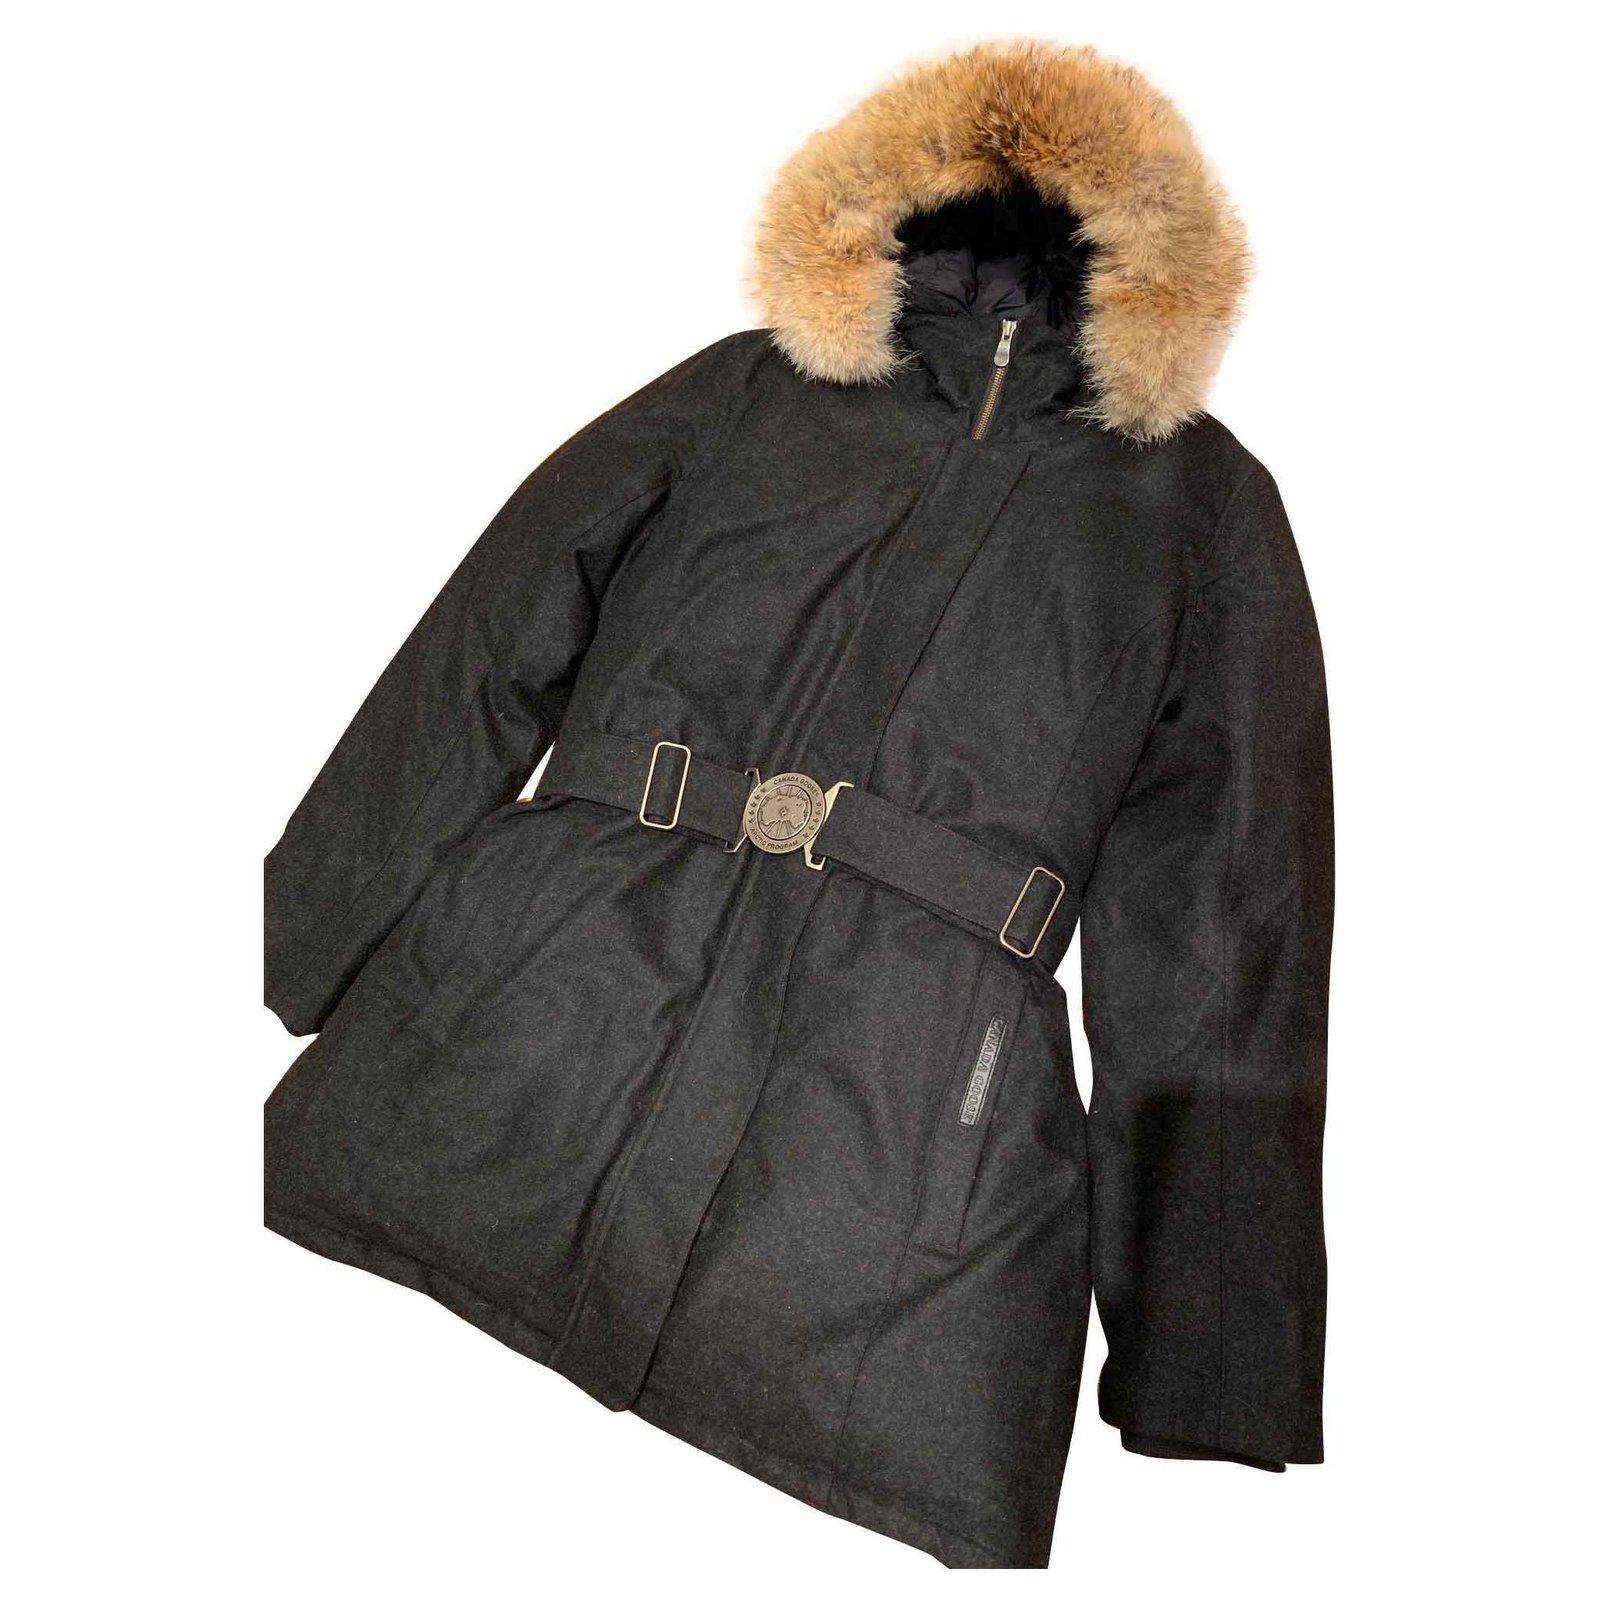 Vestes Canada Goose occasion Joli Closet